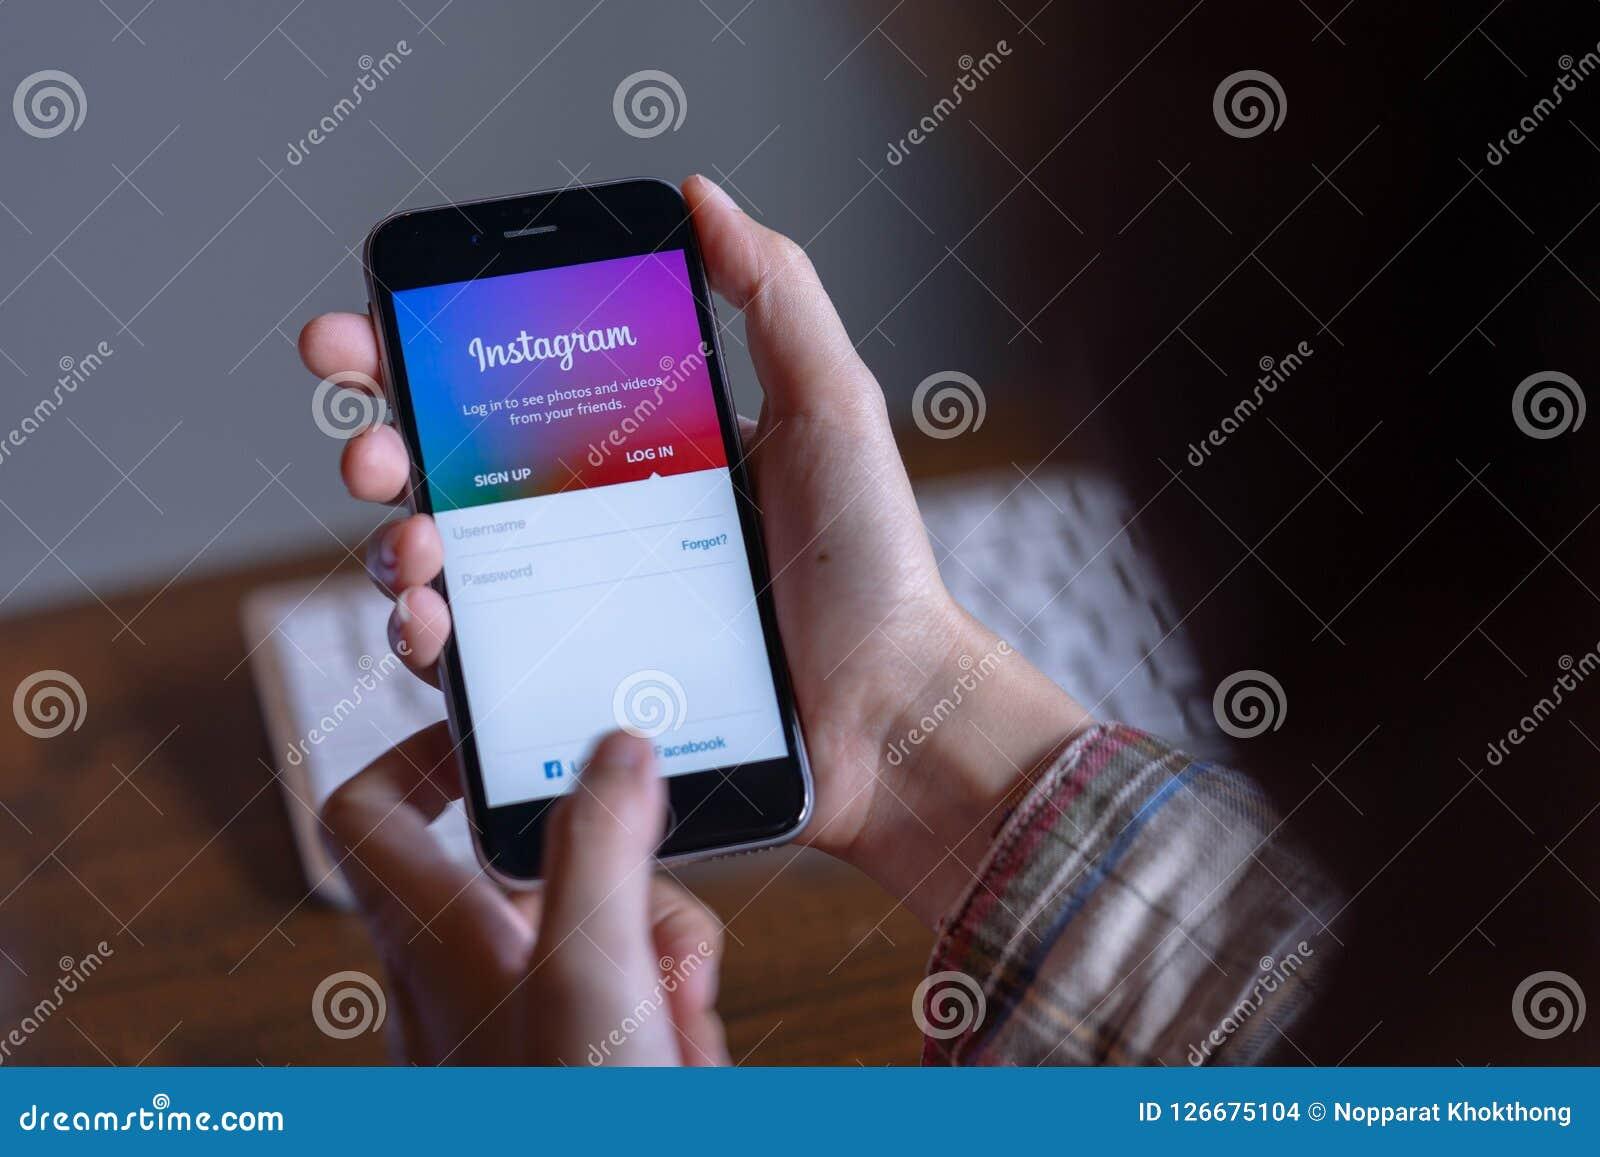 CHIANG MAI, ΤΑΪΛΆΝΔΗΣ - 30.2018 Ιουνίου: Χέρια ατόμων που κρατούν το iPhone με την εφαρμογή Instagram στην οθόνη Το Instagram είν